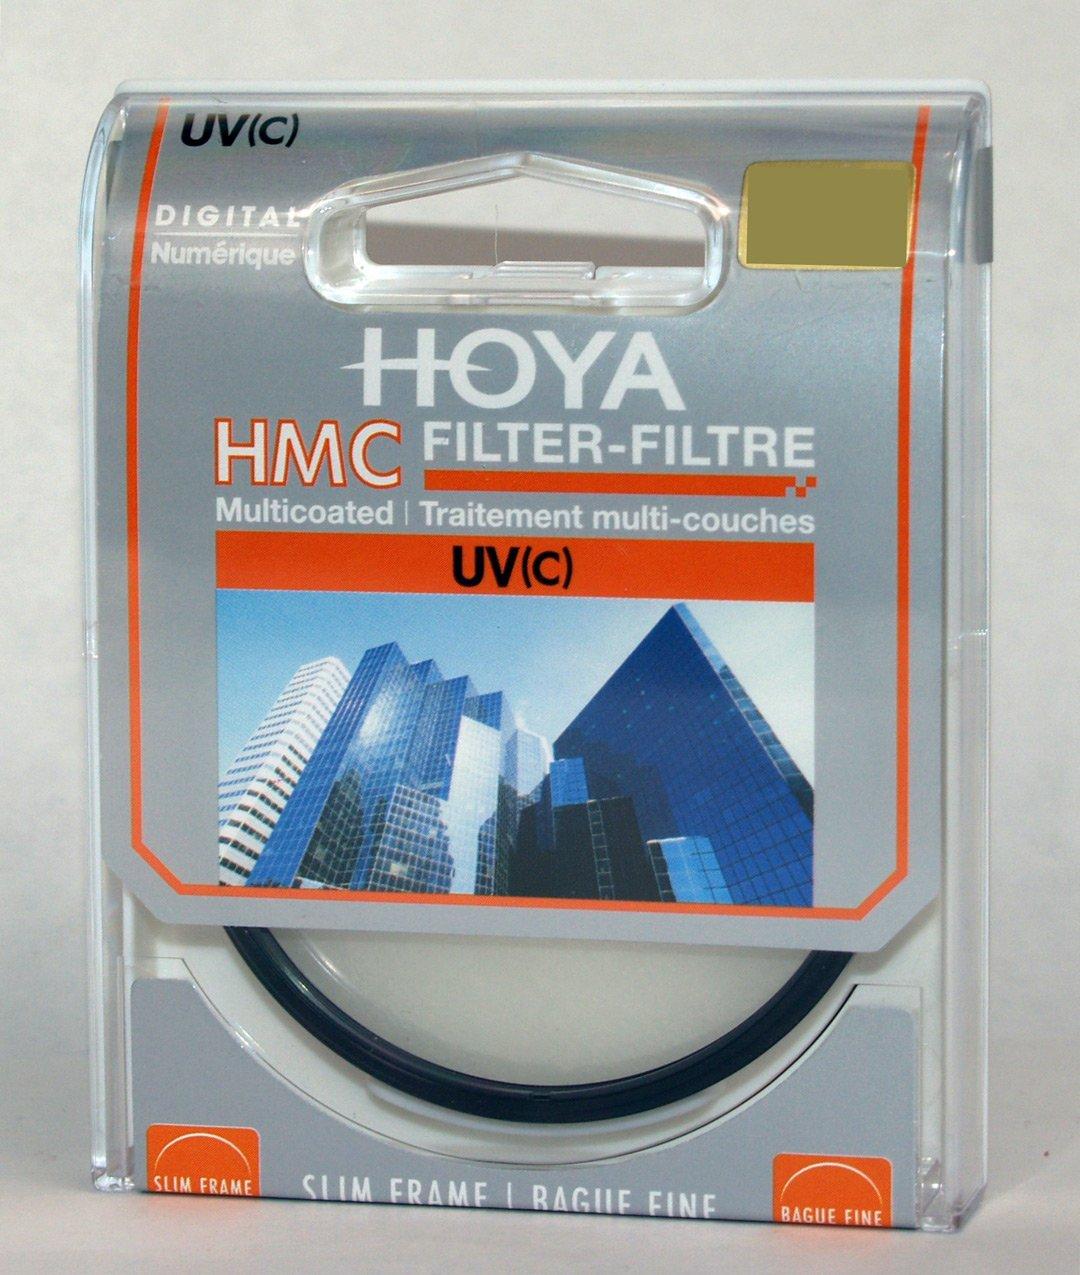 Hoya 62mm Ultraviolet UV(c) Haze Multicoated Filter